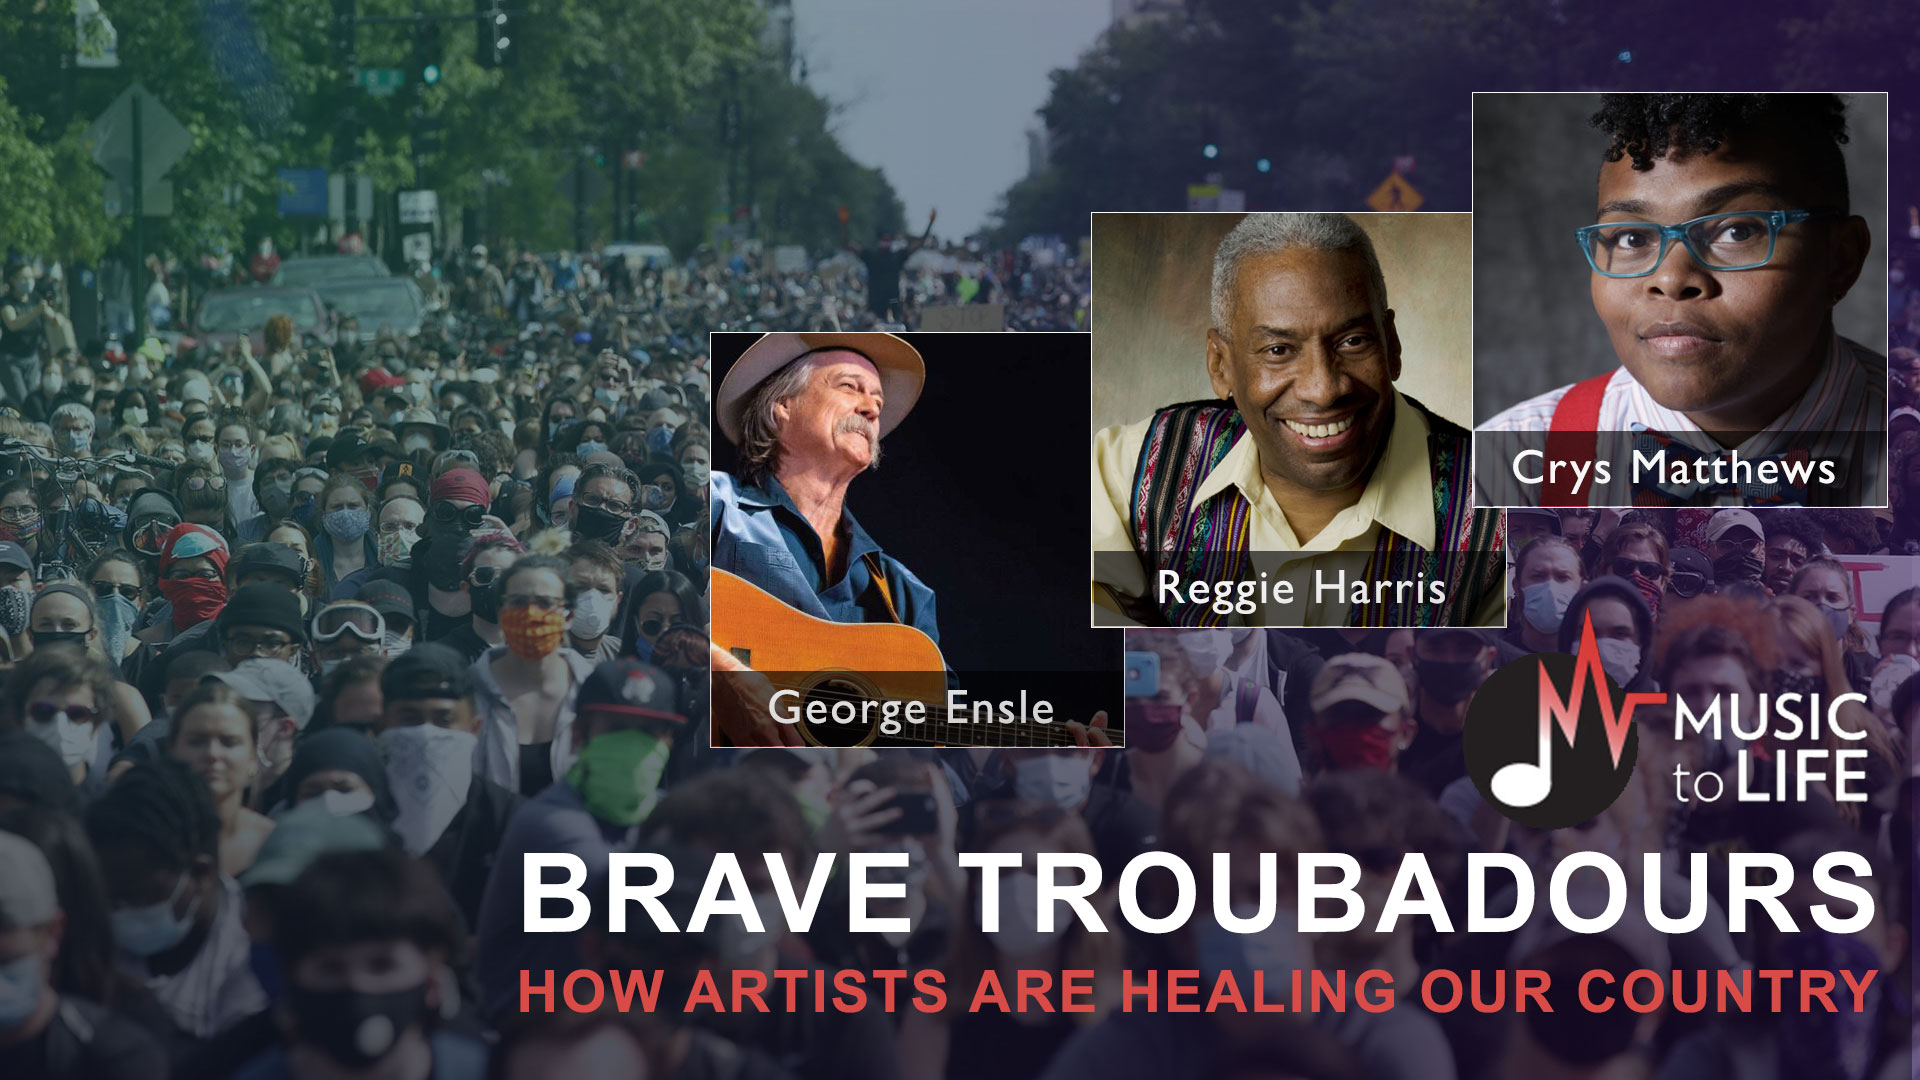 Brave Troubadours: January 14, 2021